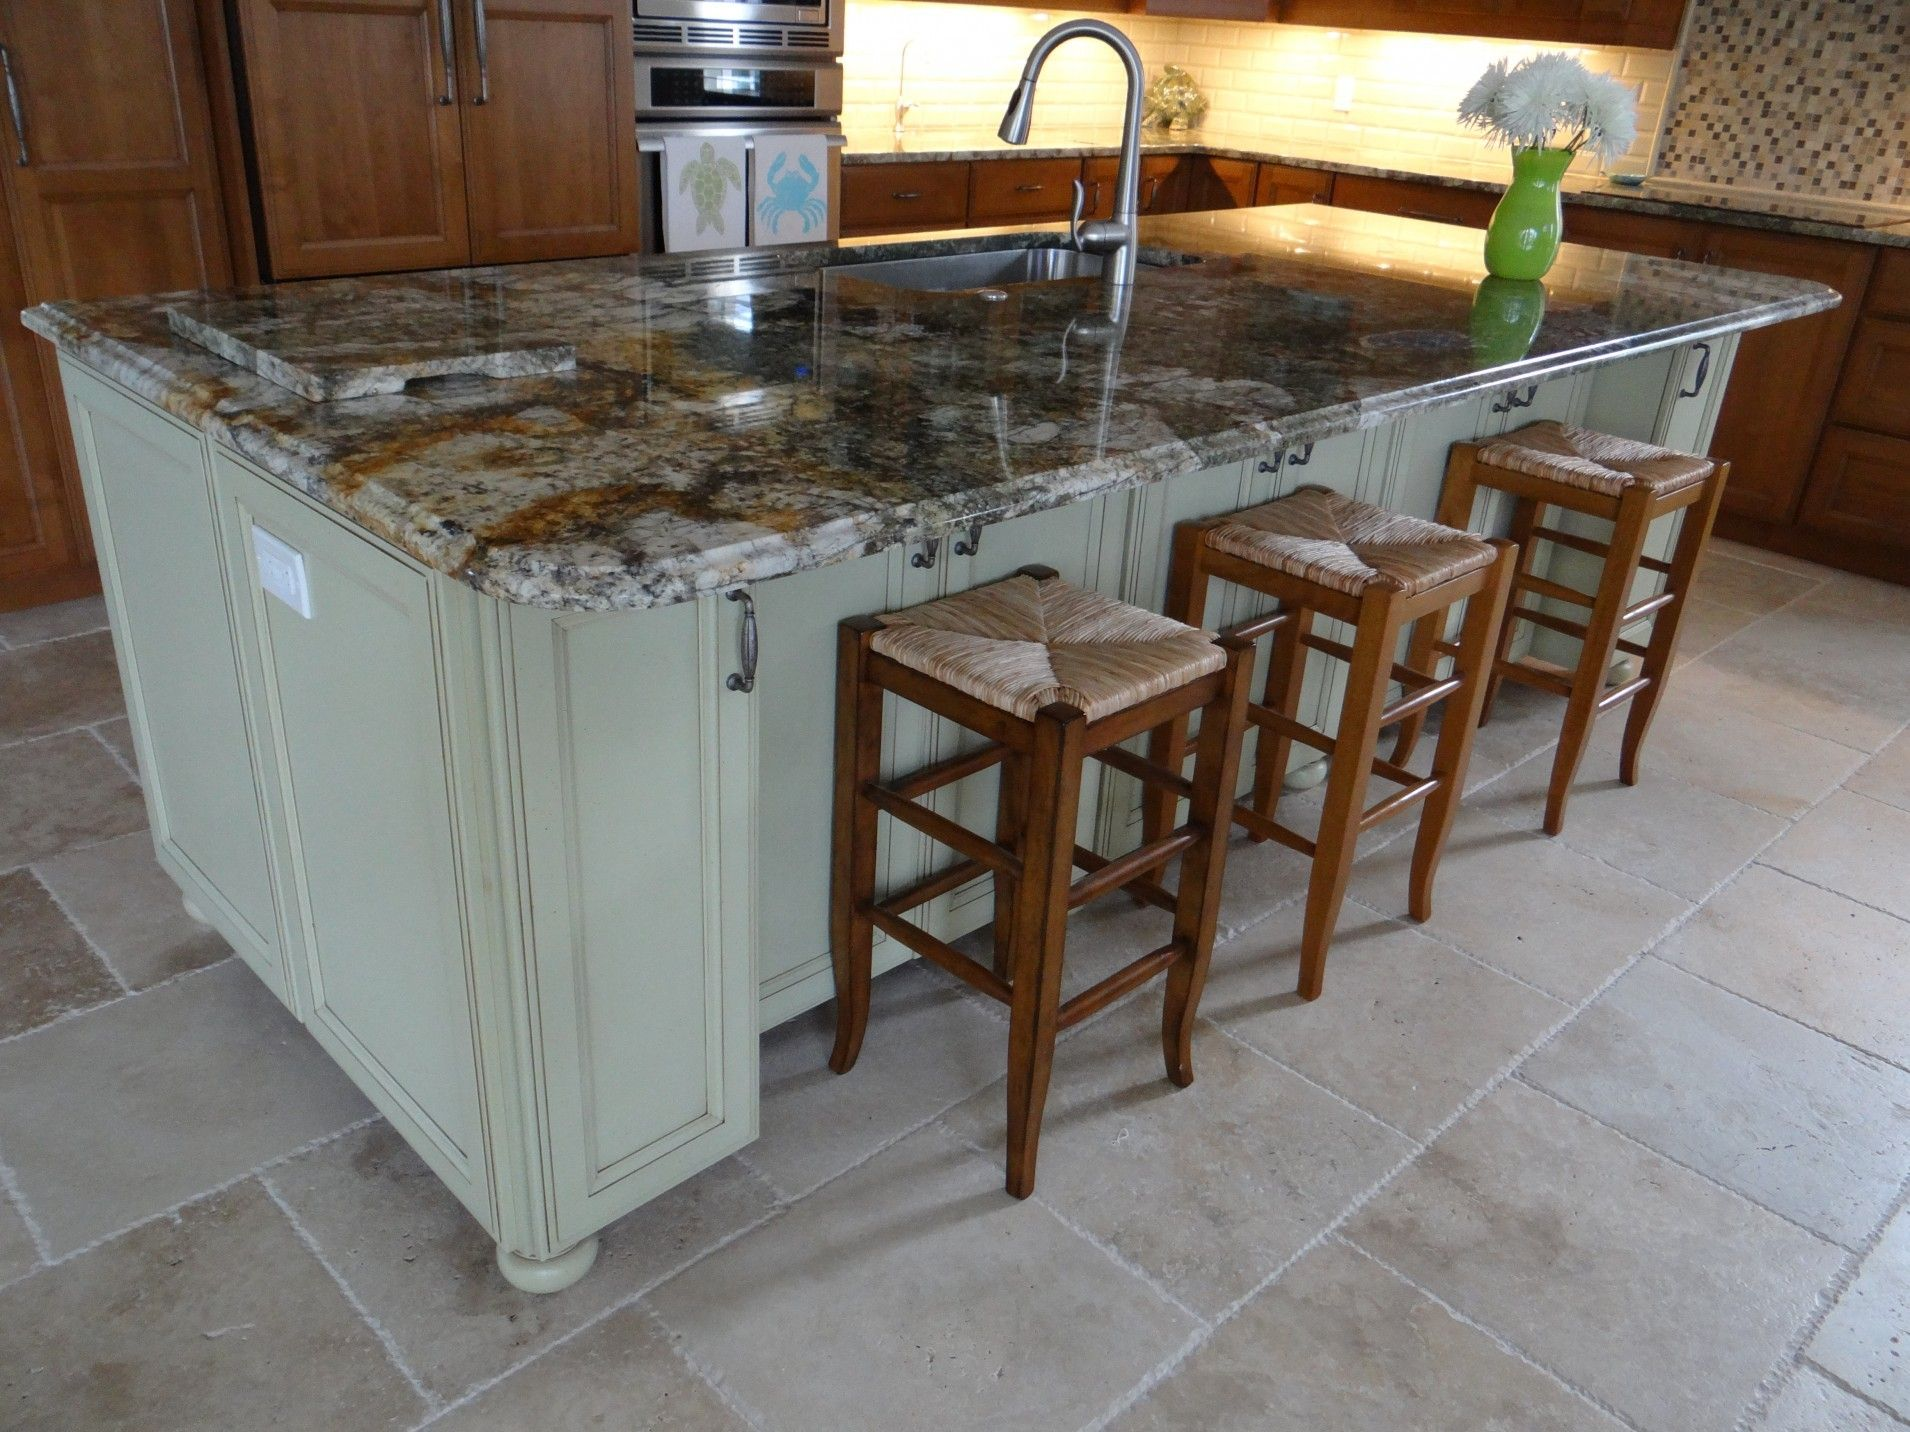 Holiday Kitchens Davenport 3 In. Stiles U0026 Rails | Dealer: Inndesign Inc   FL